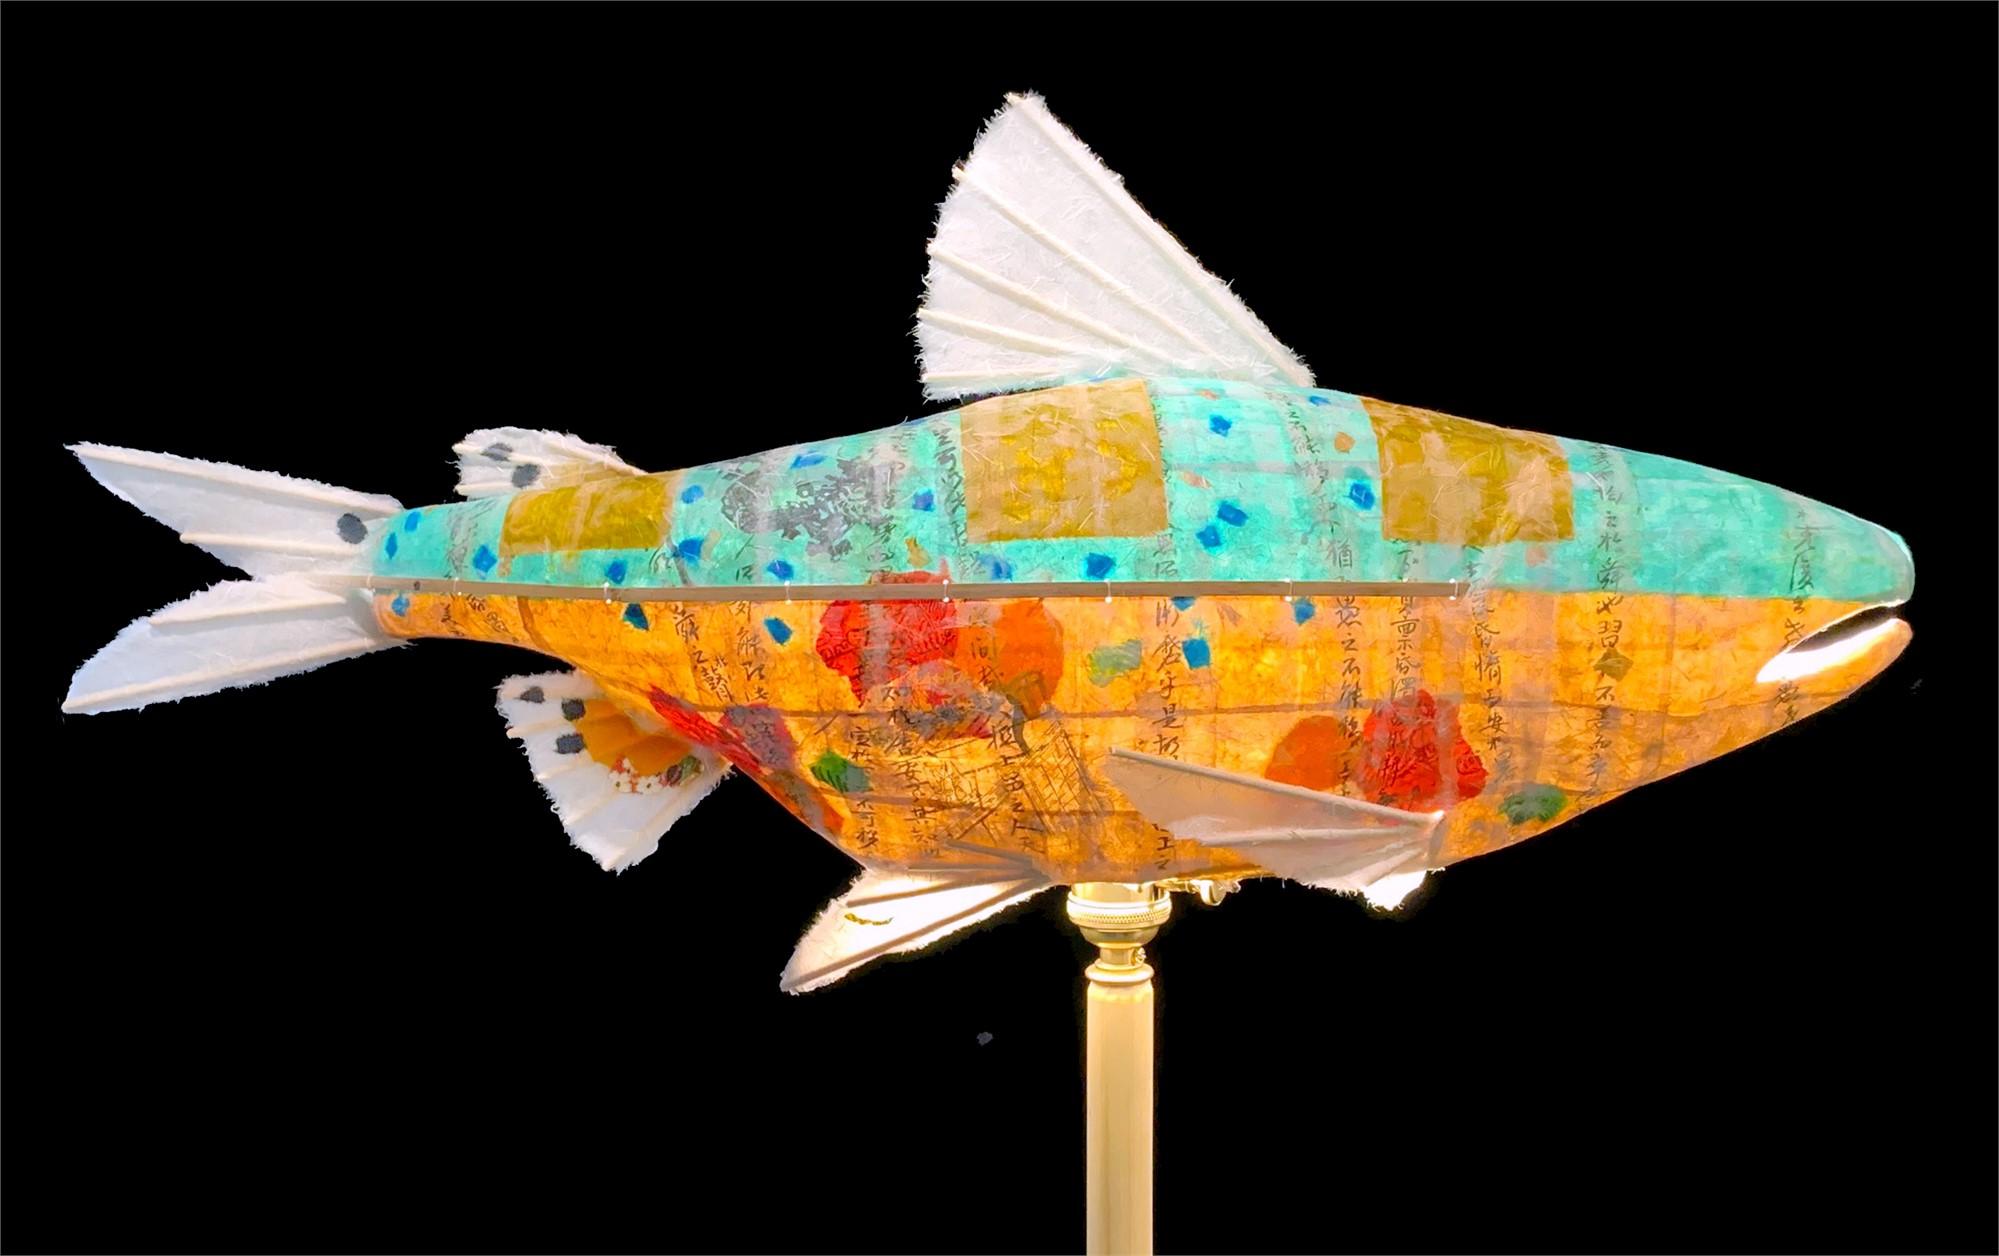 Turquoise River Salmon by Elaine Hanowell